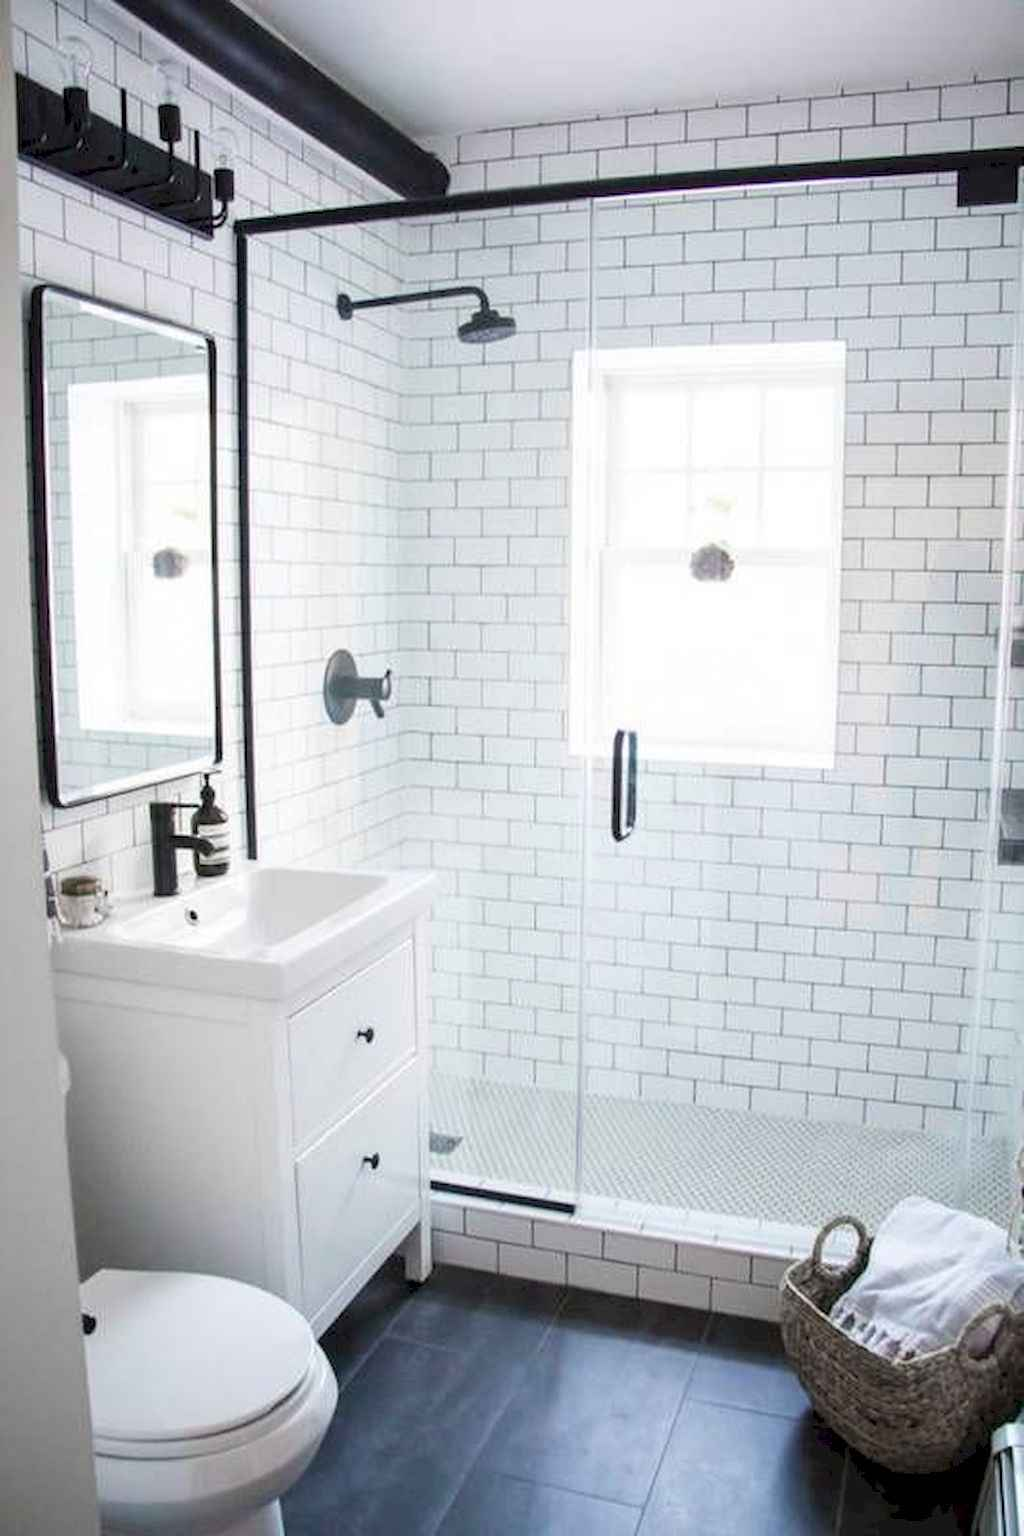 111 Brilliant Small Bathroom Remodel Ideas On A Budget (99)